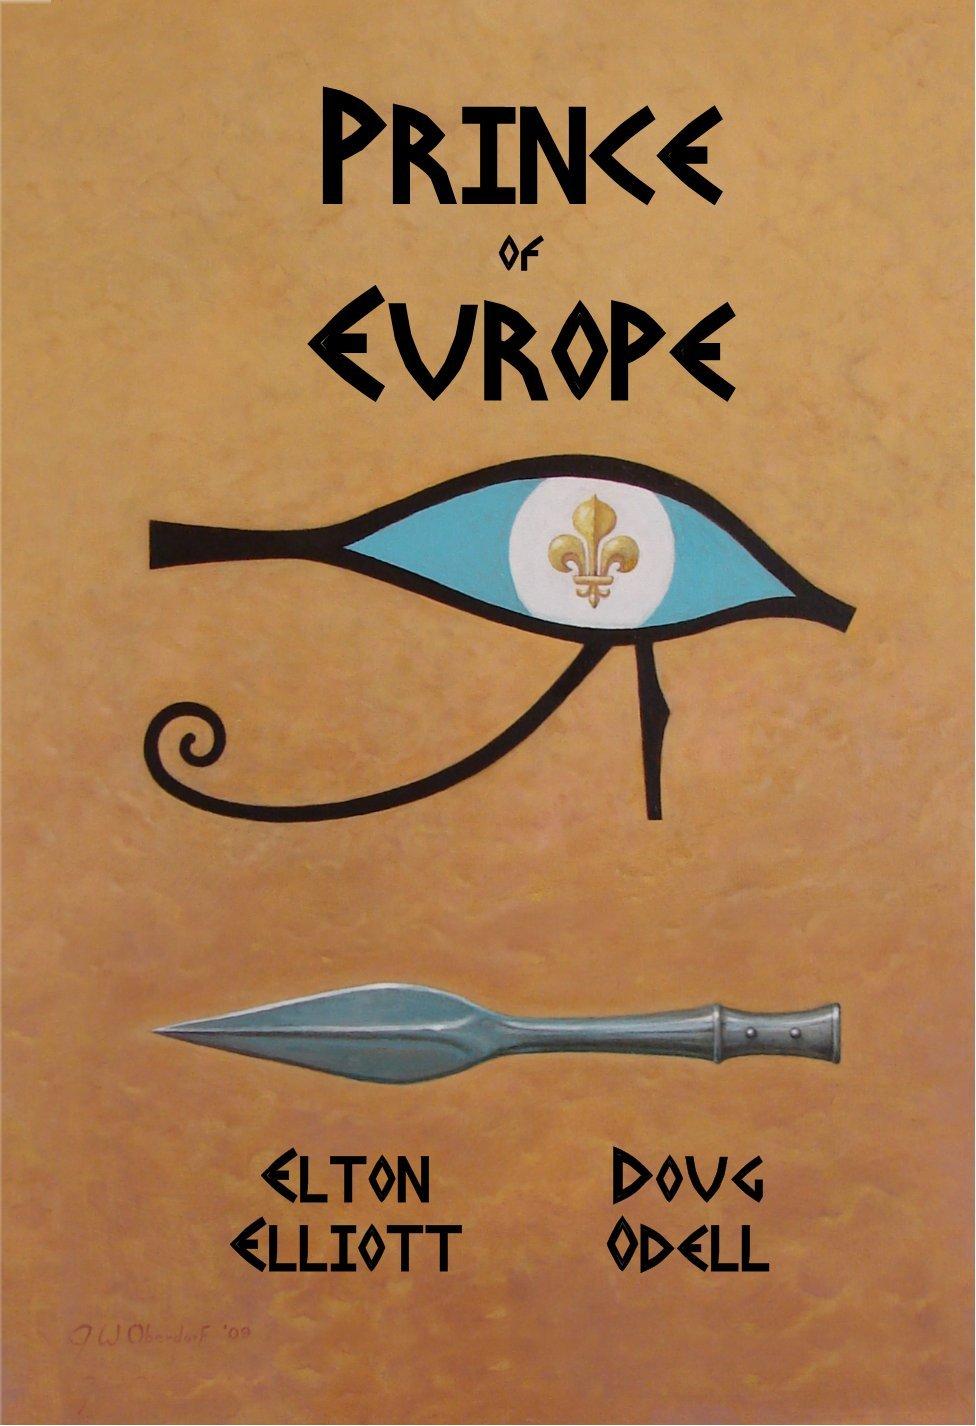 Prince Of Europe by Elton Elliott